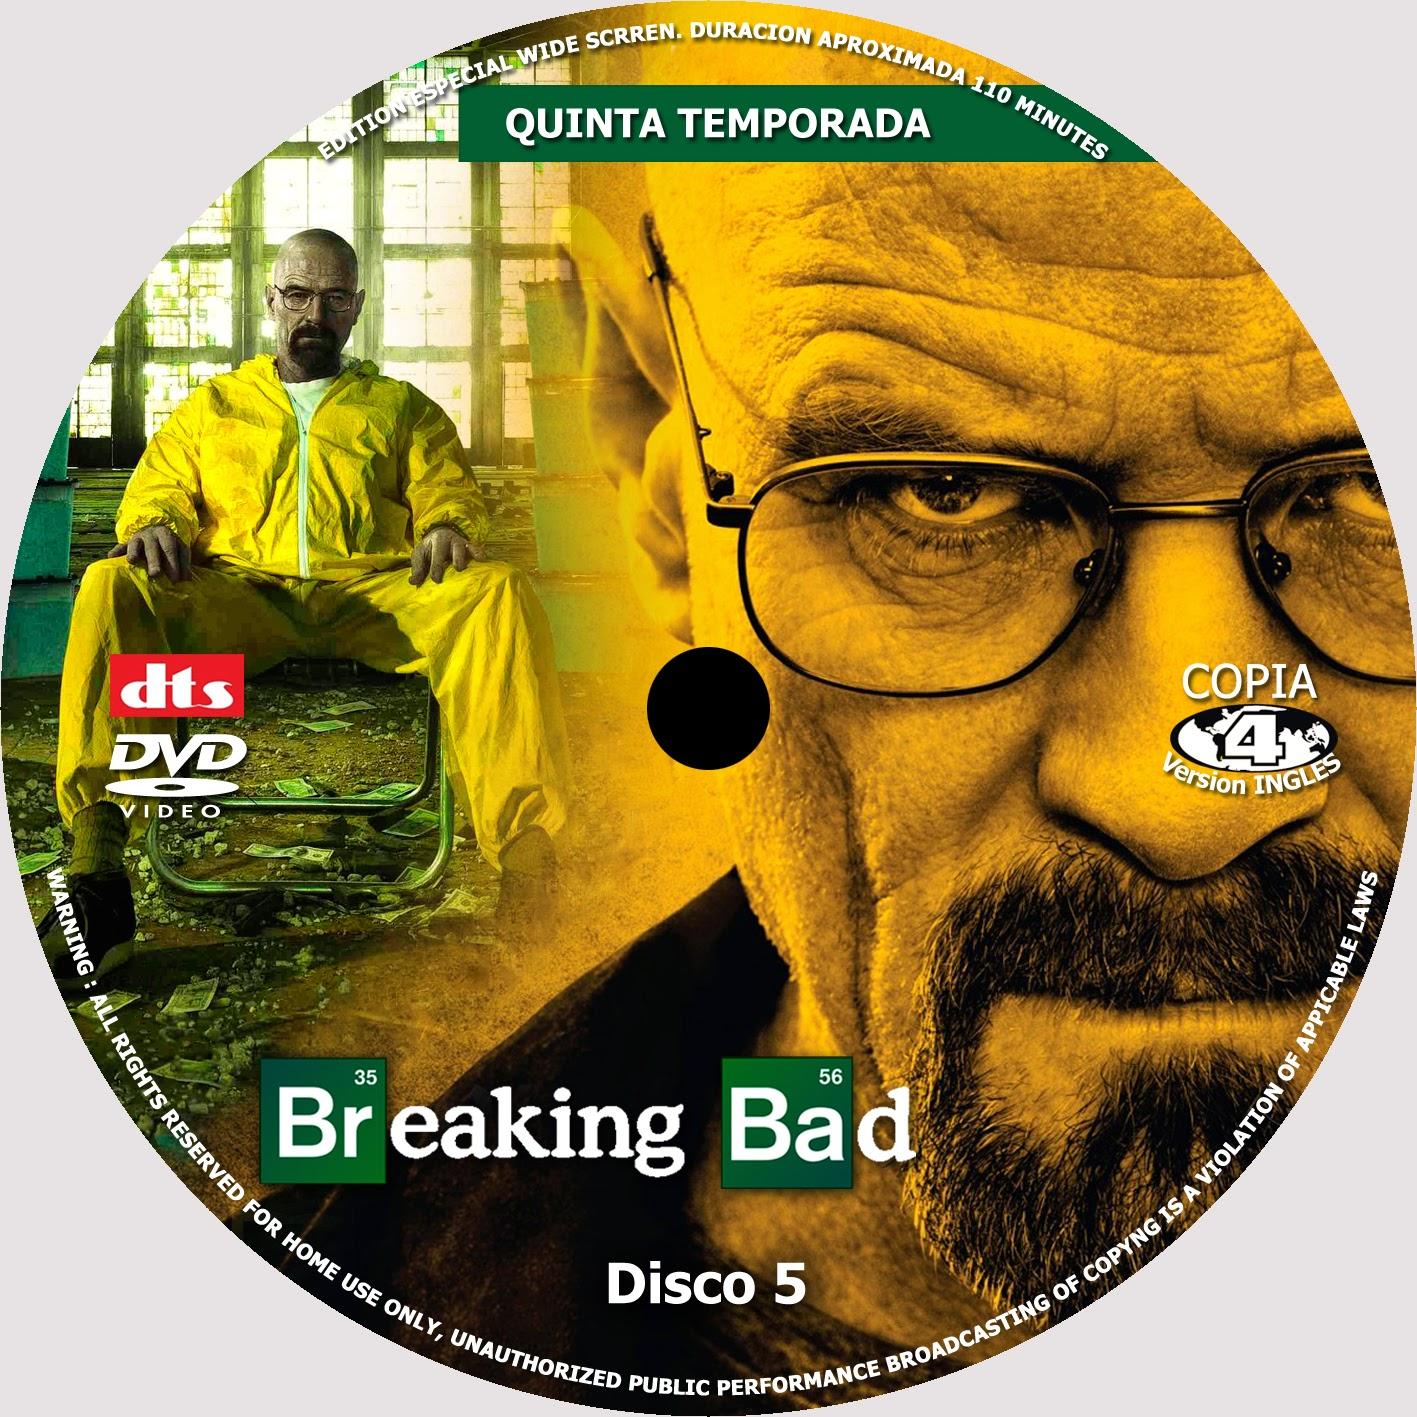 covercaratulas de dvd cd covercreators breaking bad